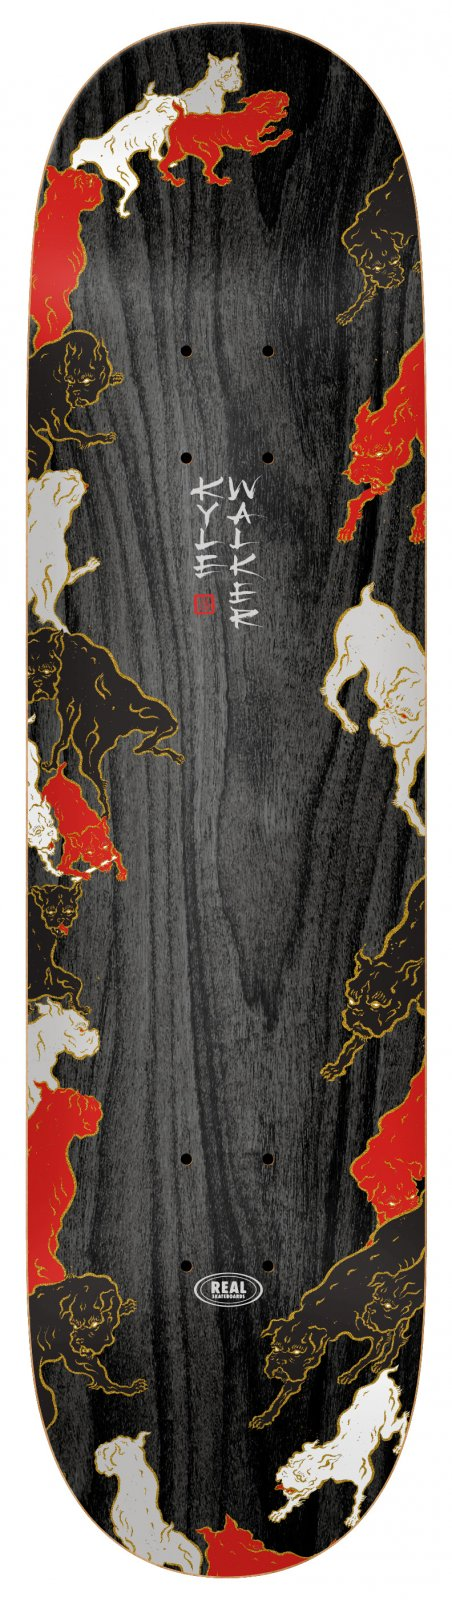 Real Kyle Mr.Tucks Rats 8.12 x 32 Skateboard Deck